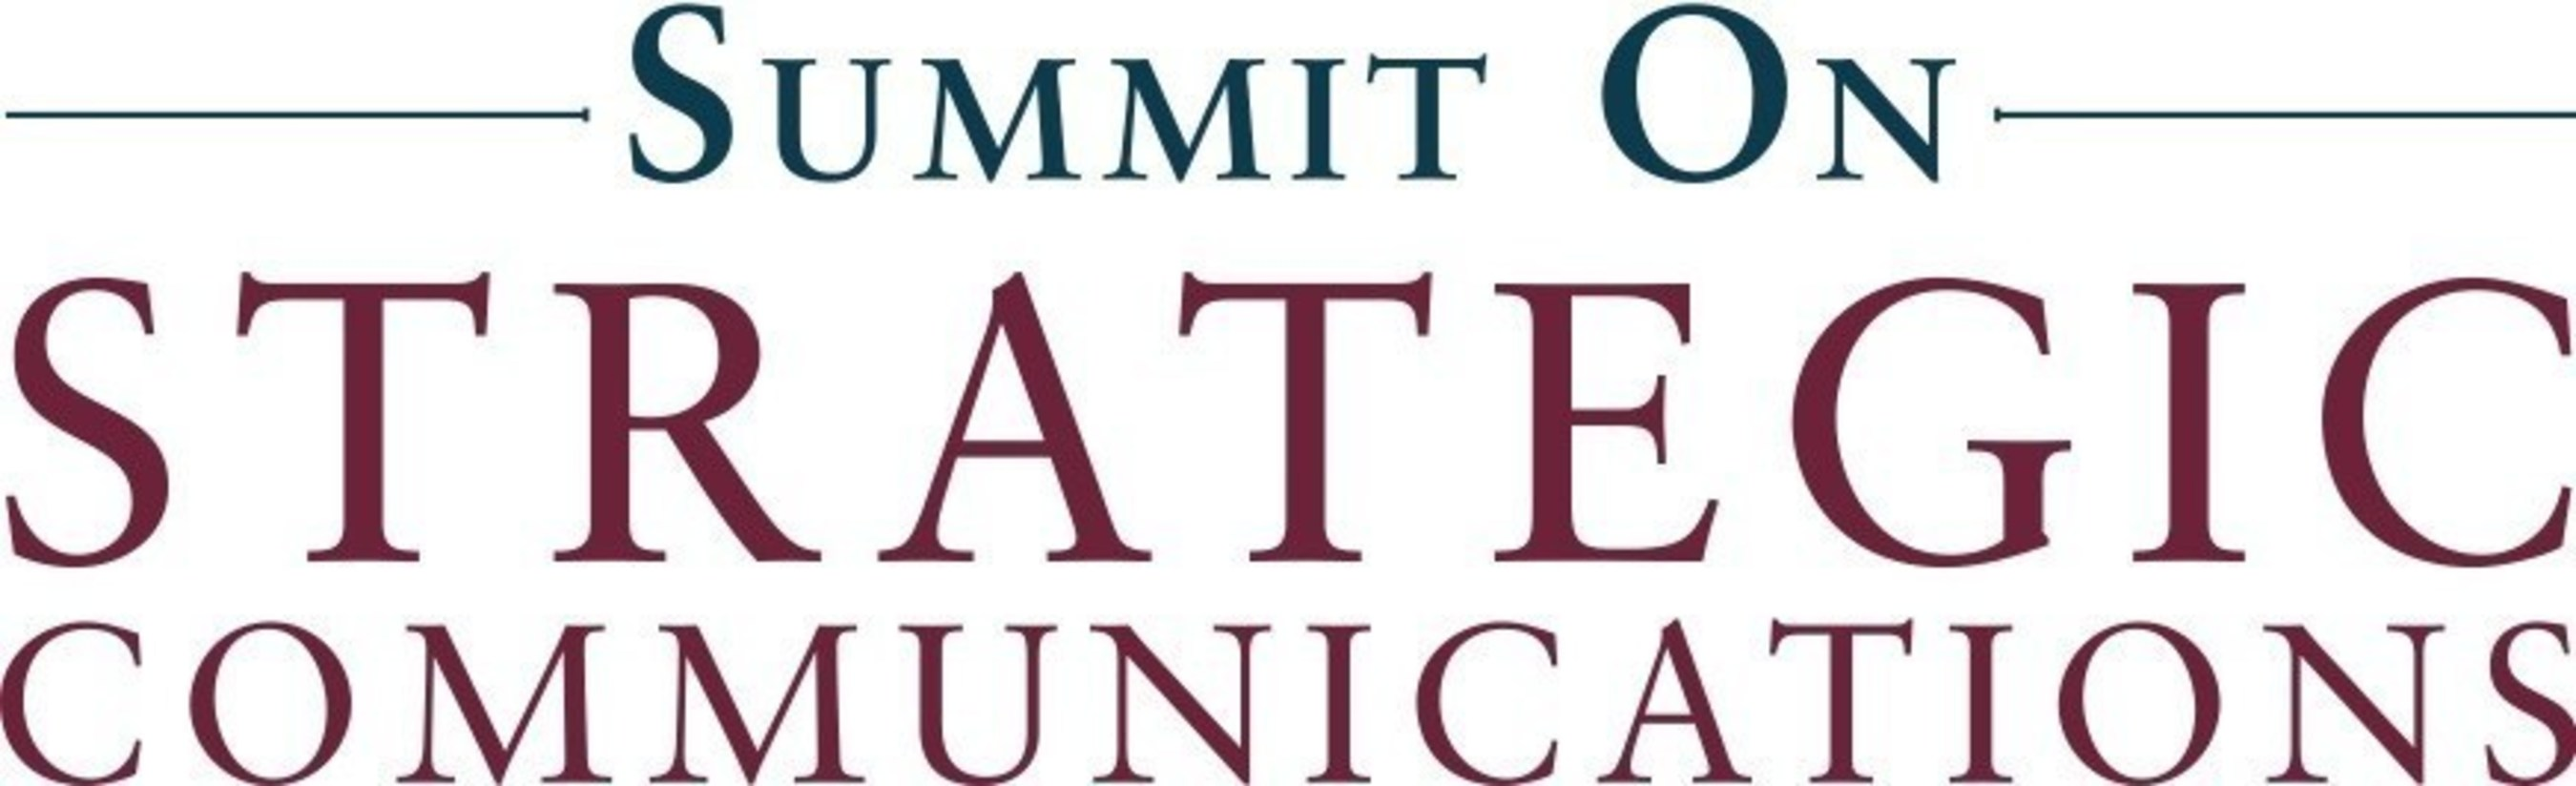 Summit on Strategic Communications